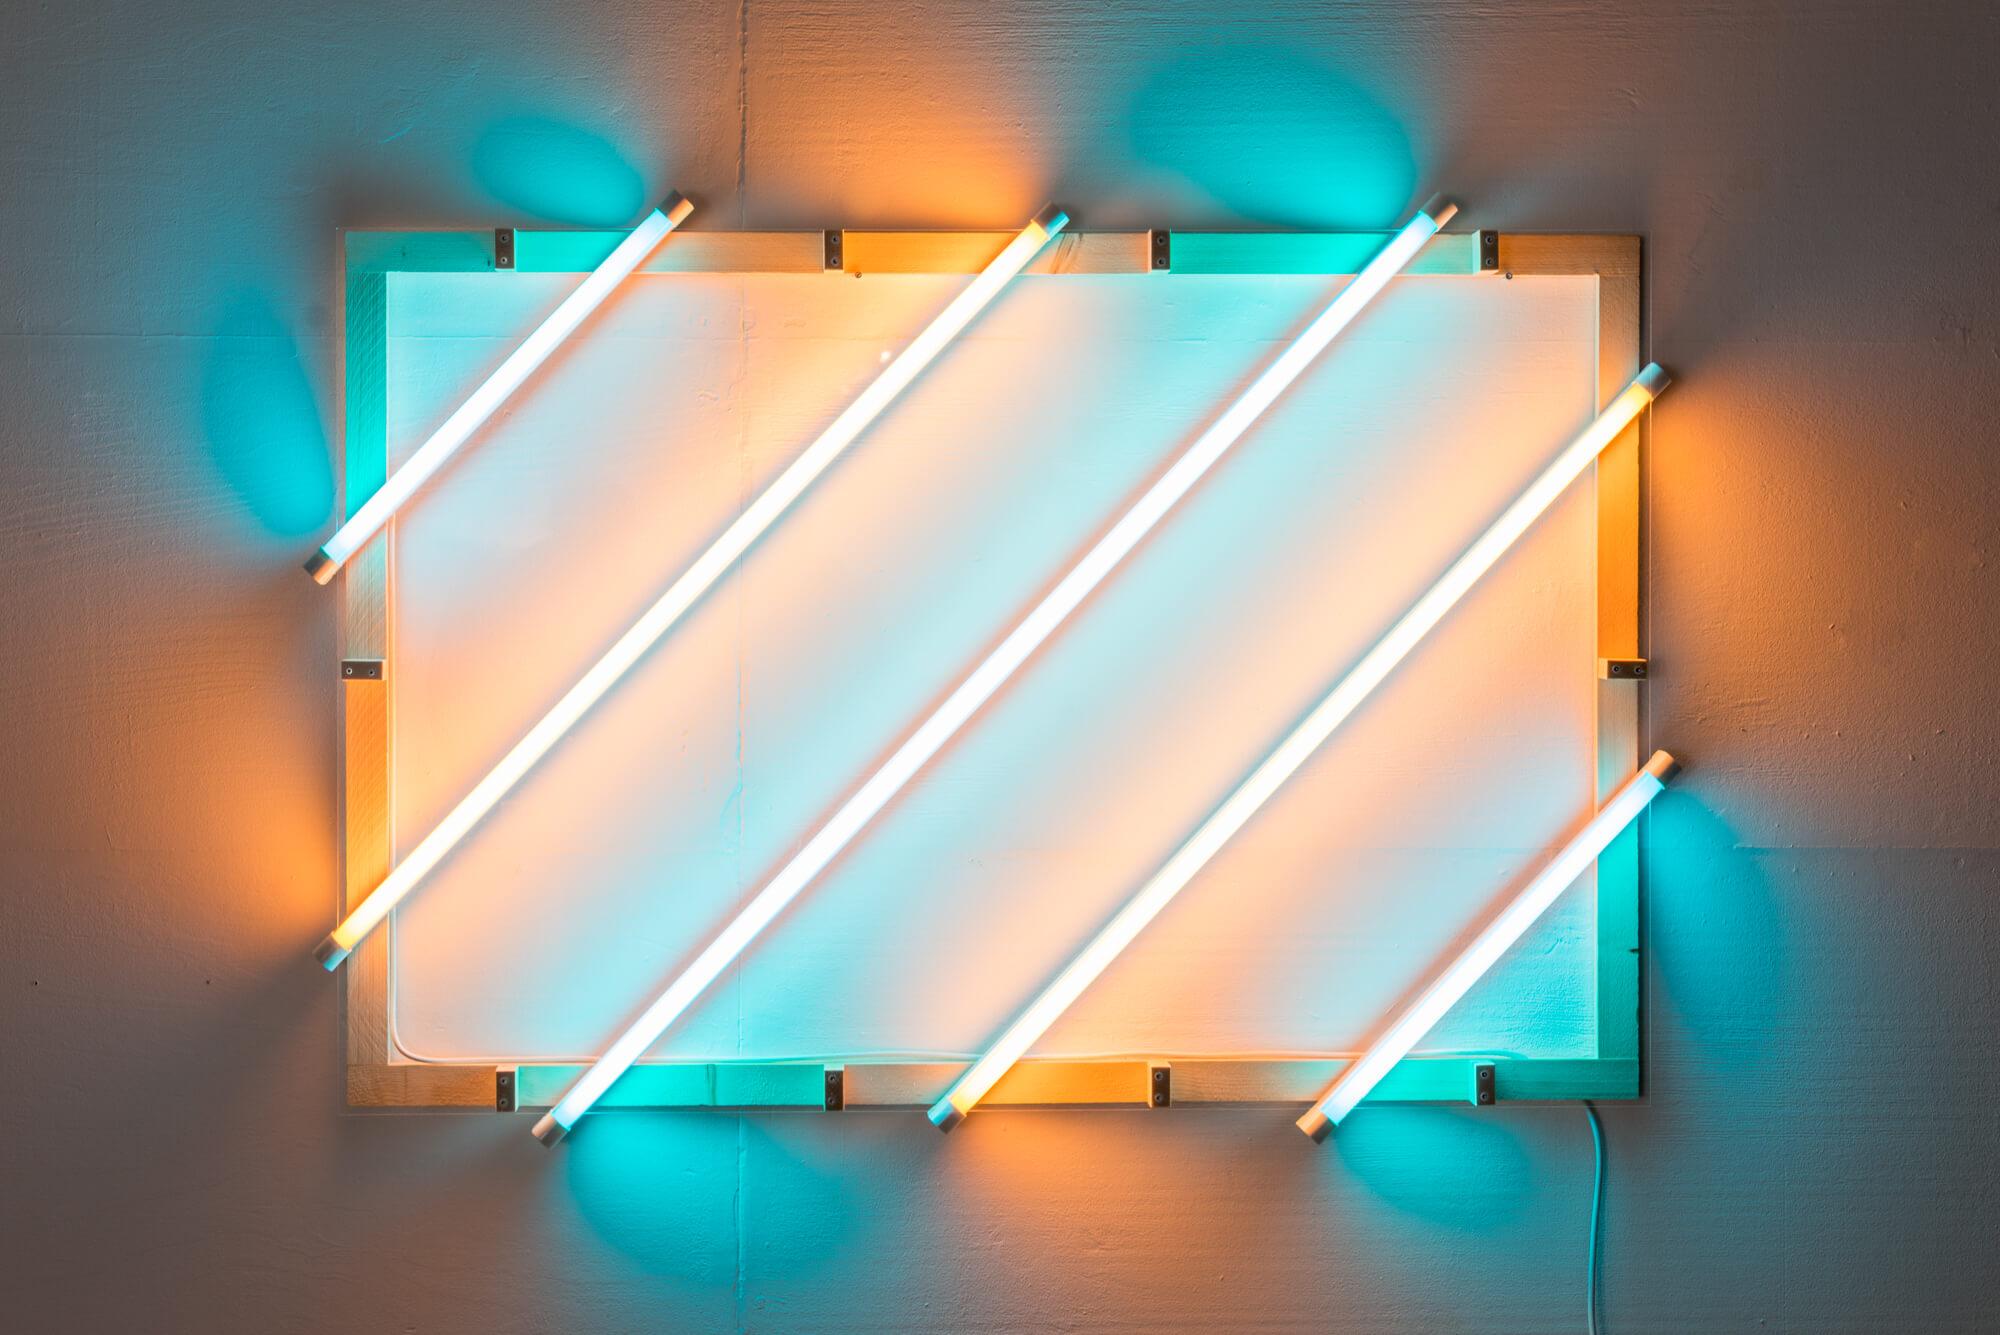 Tizian Baldinger, Affenfaust Galerie